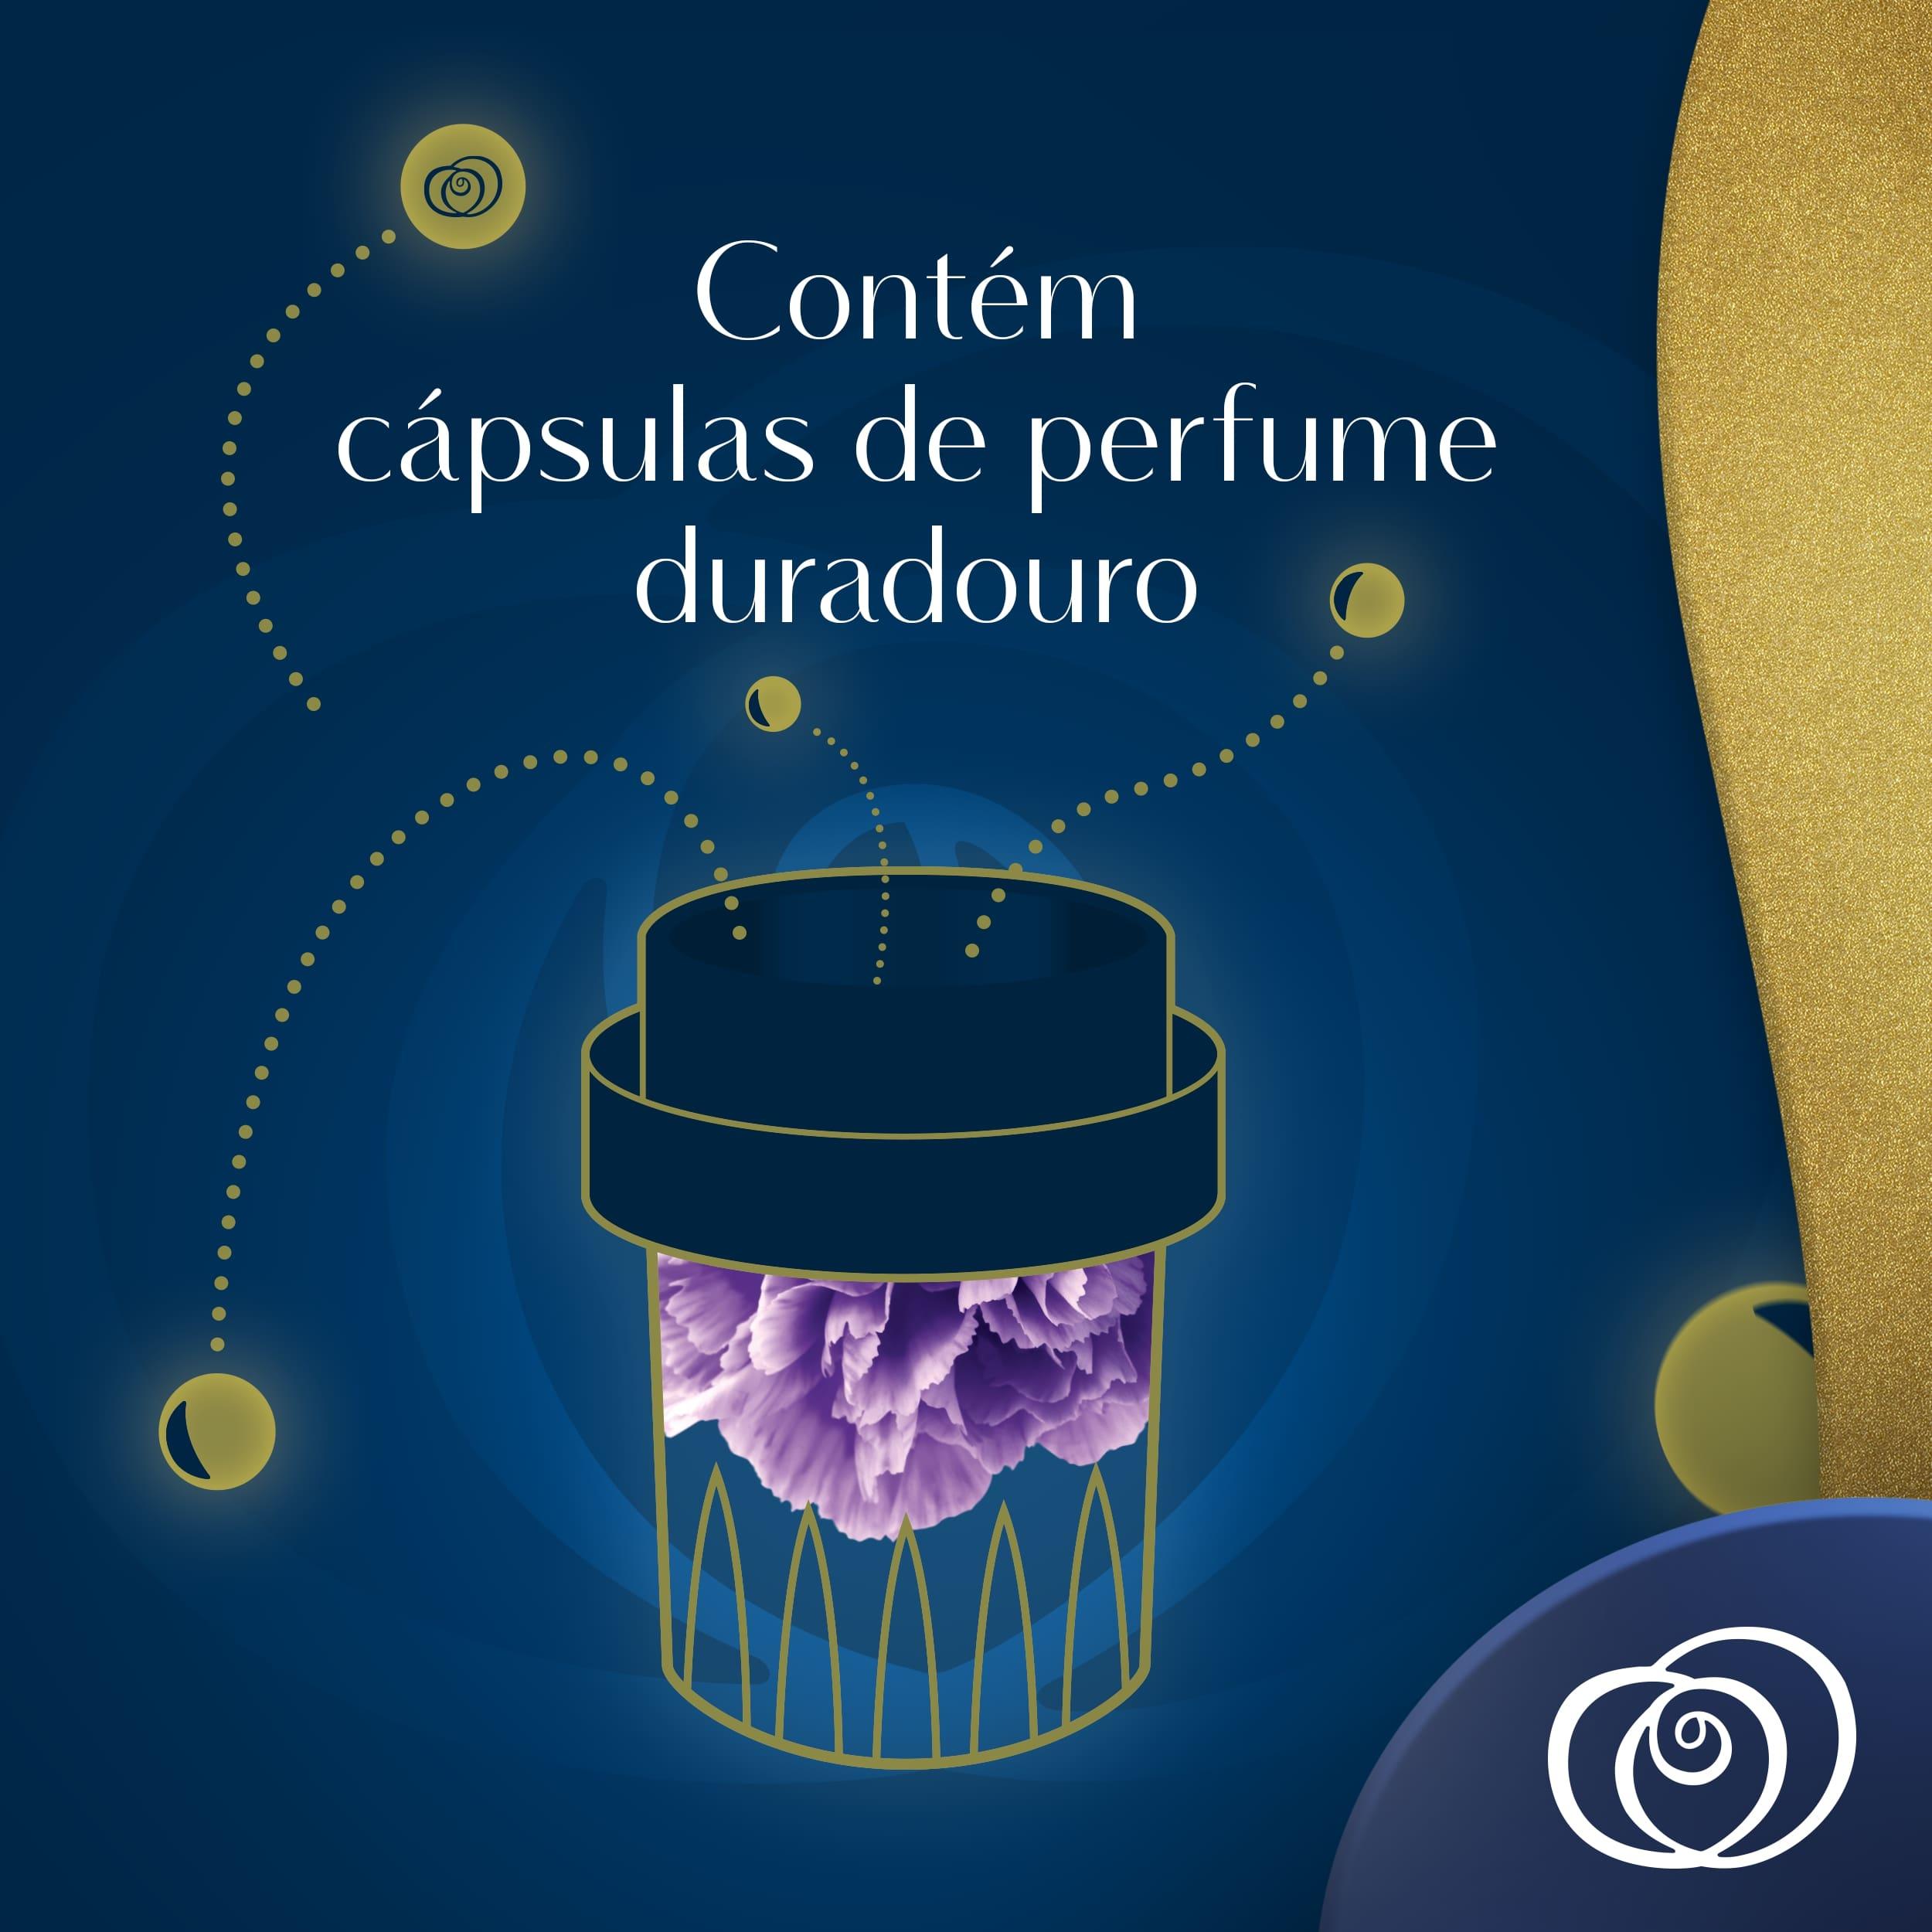 Amaciante Downy Perfume Collection Místico Secondary 03